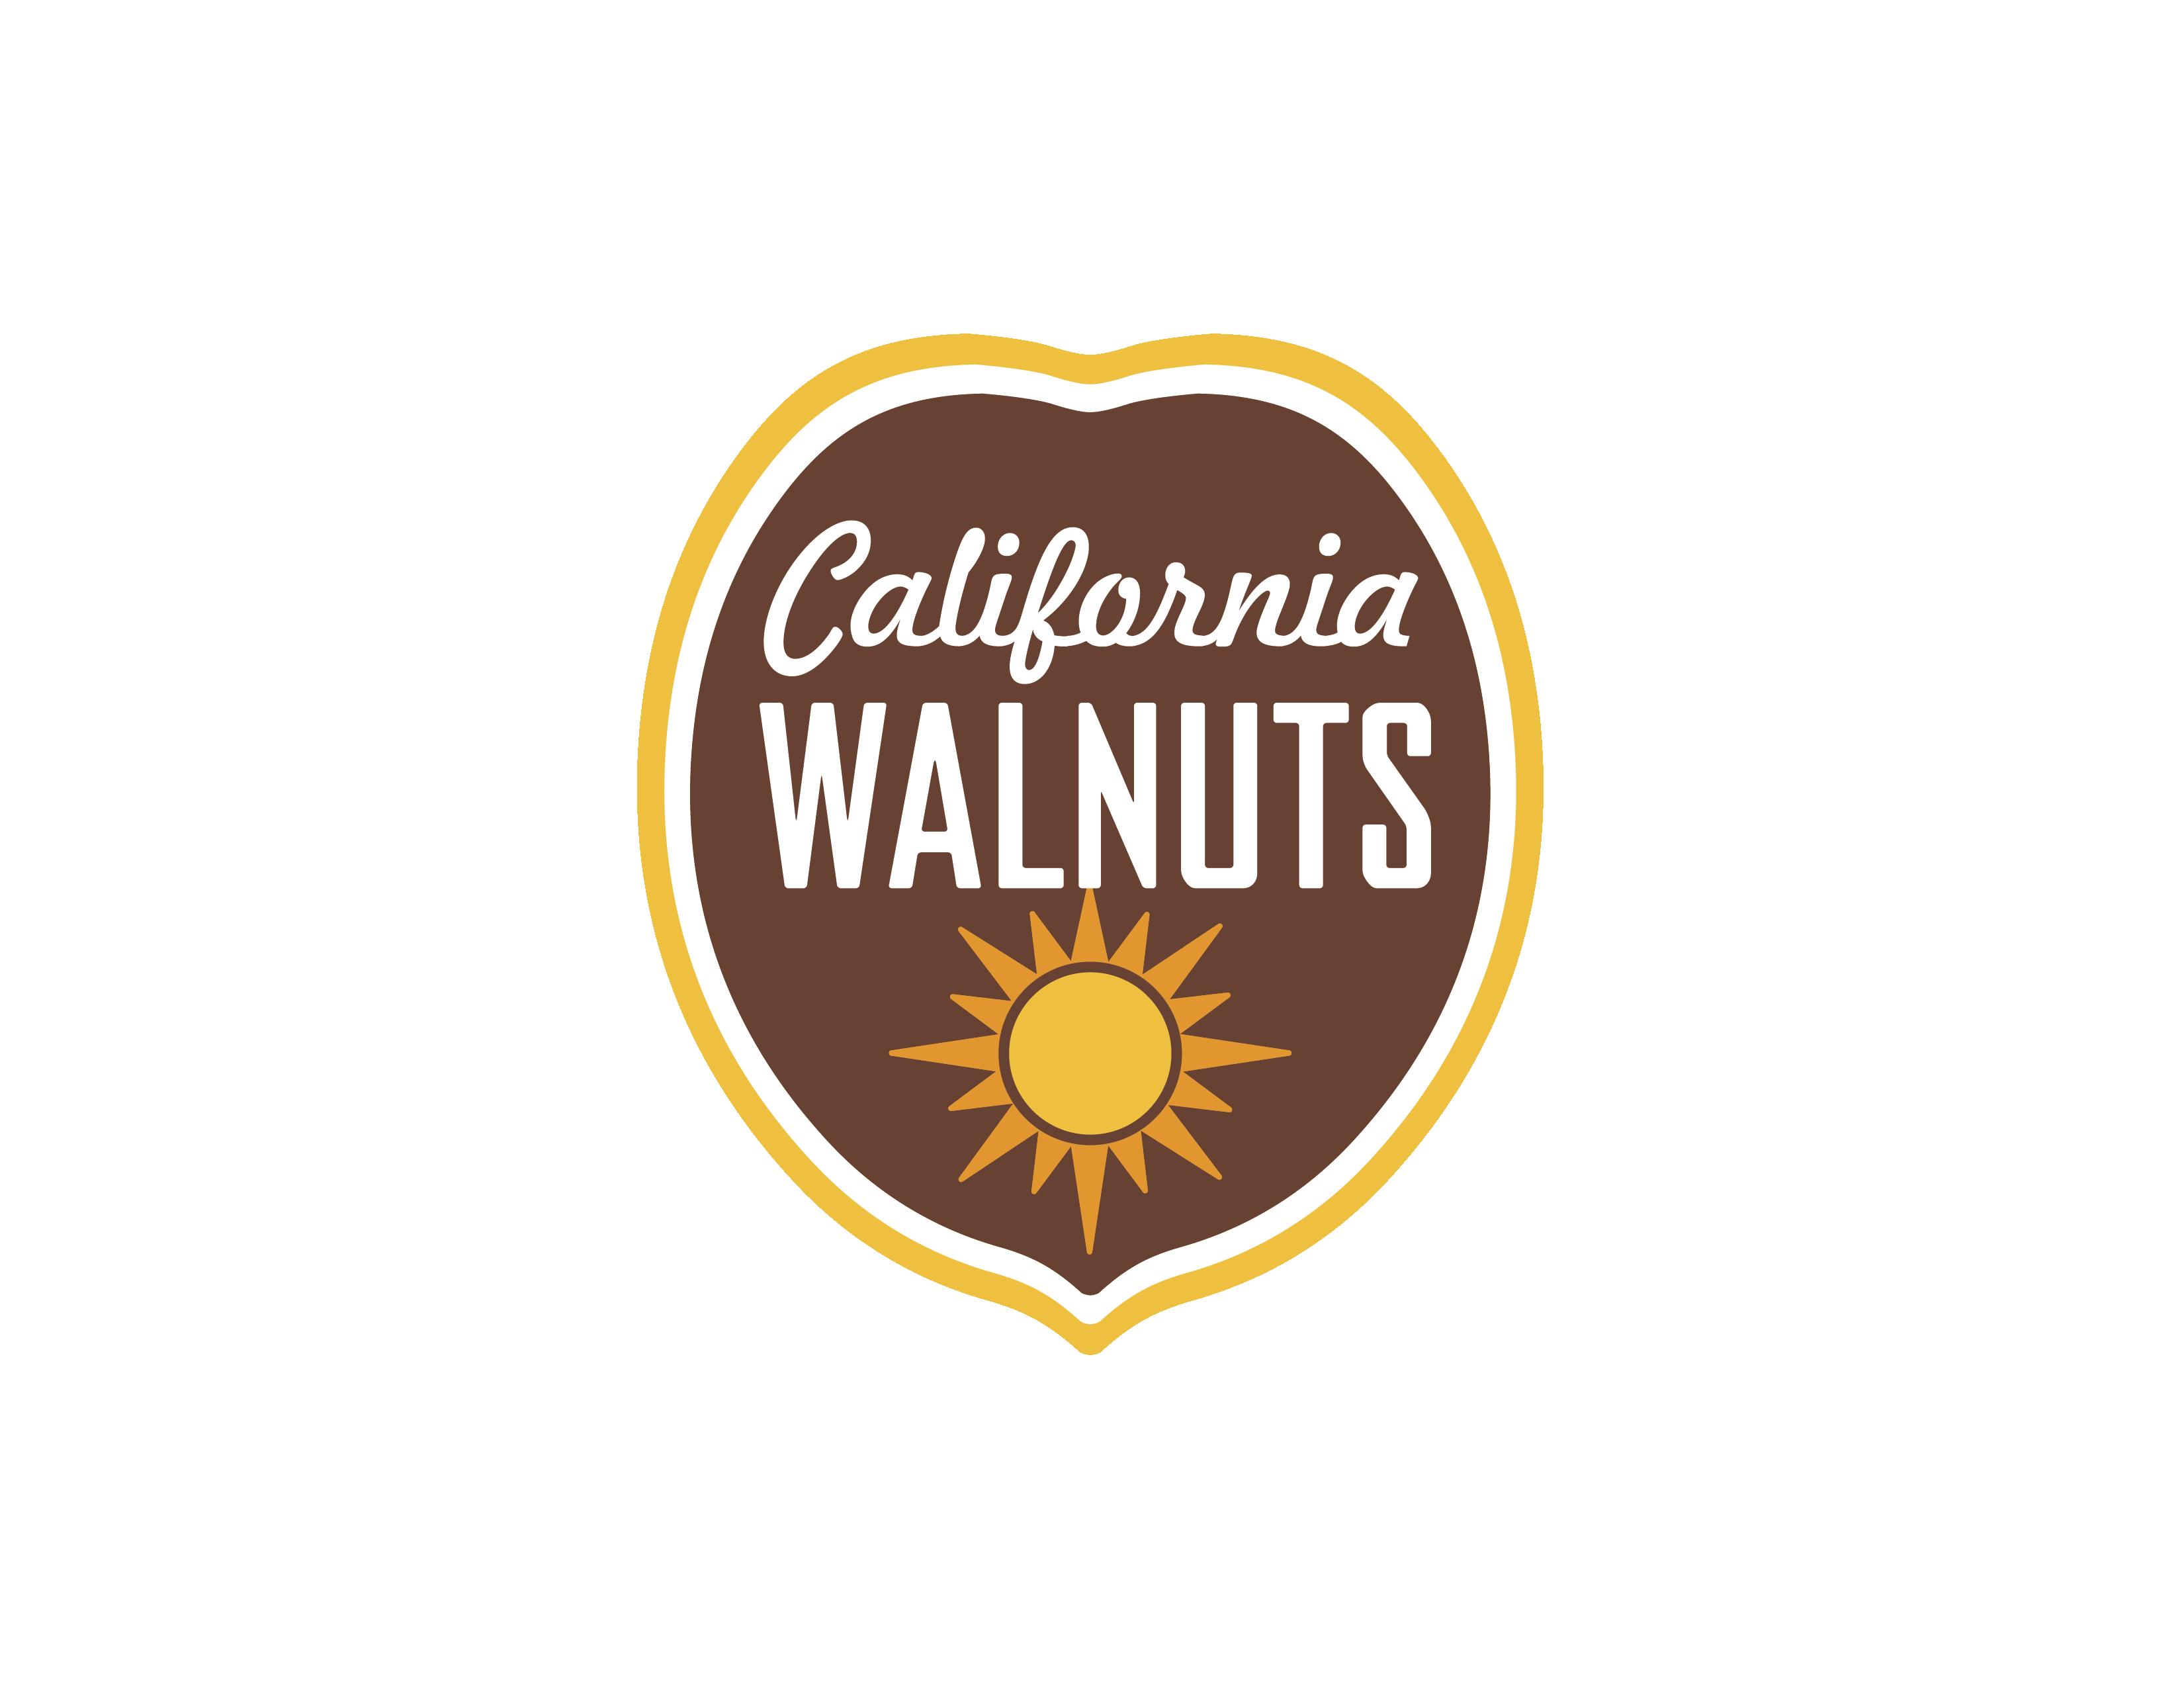 CA_Walnuts_Logo 110117 cmyk fin NoTM-01